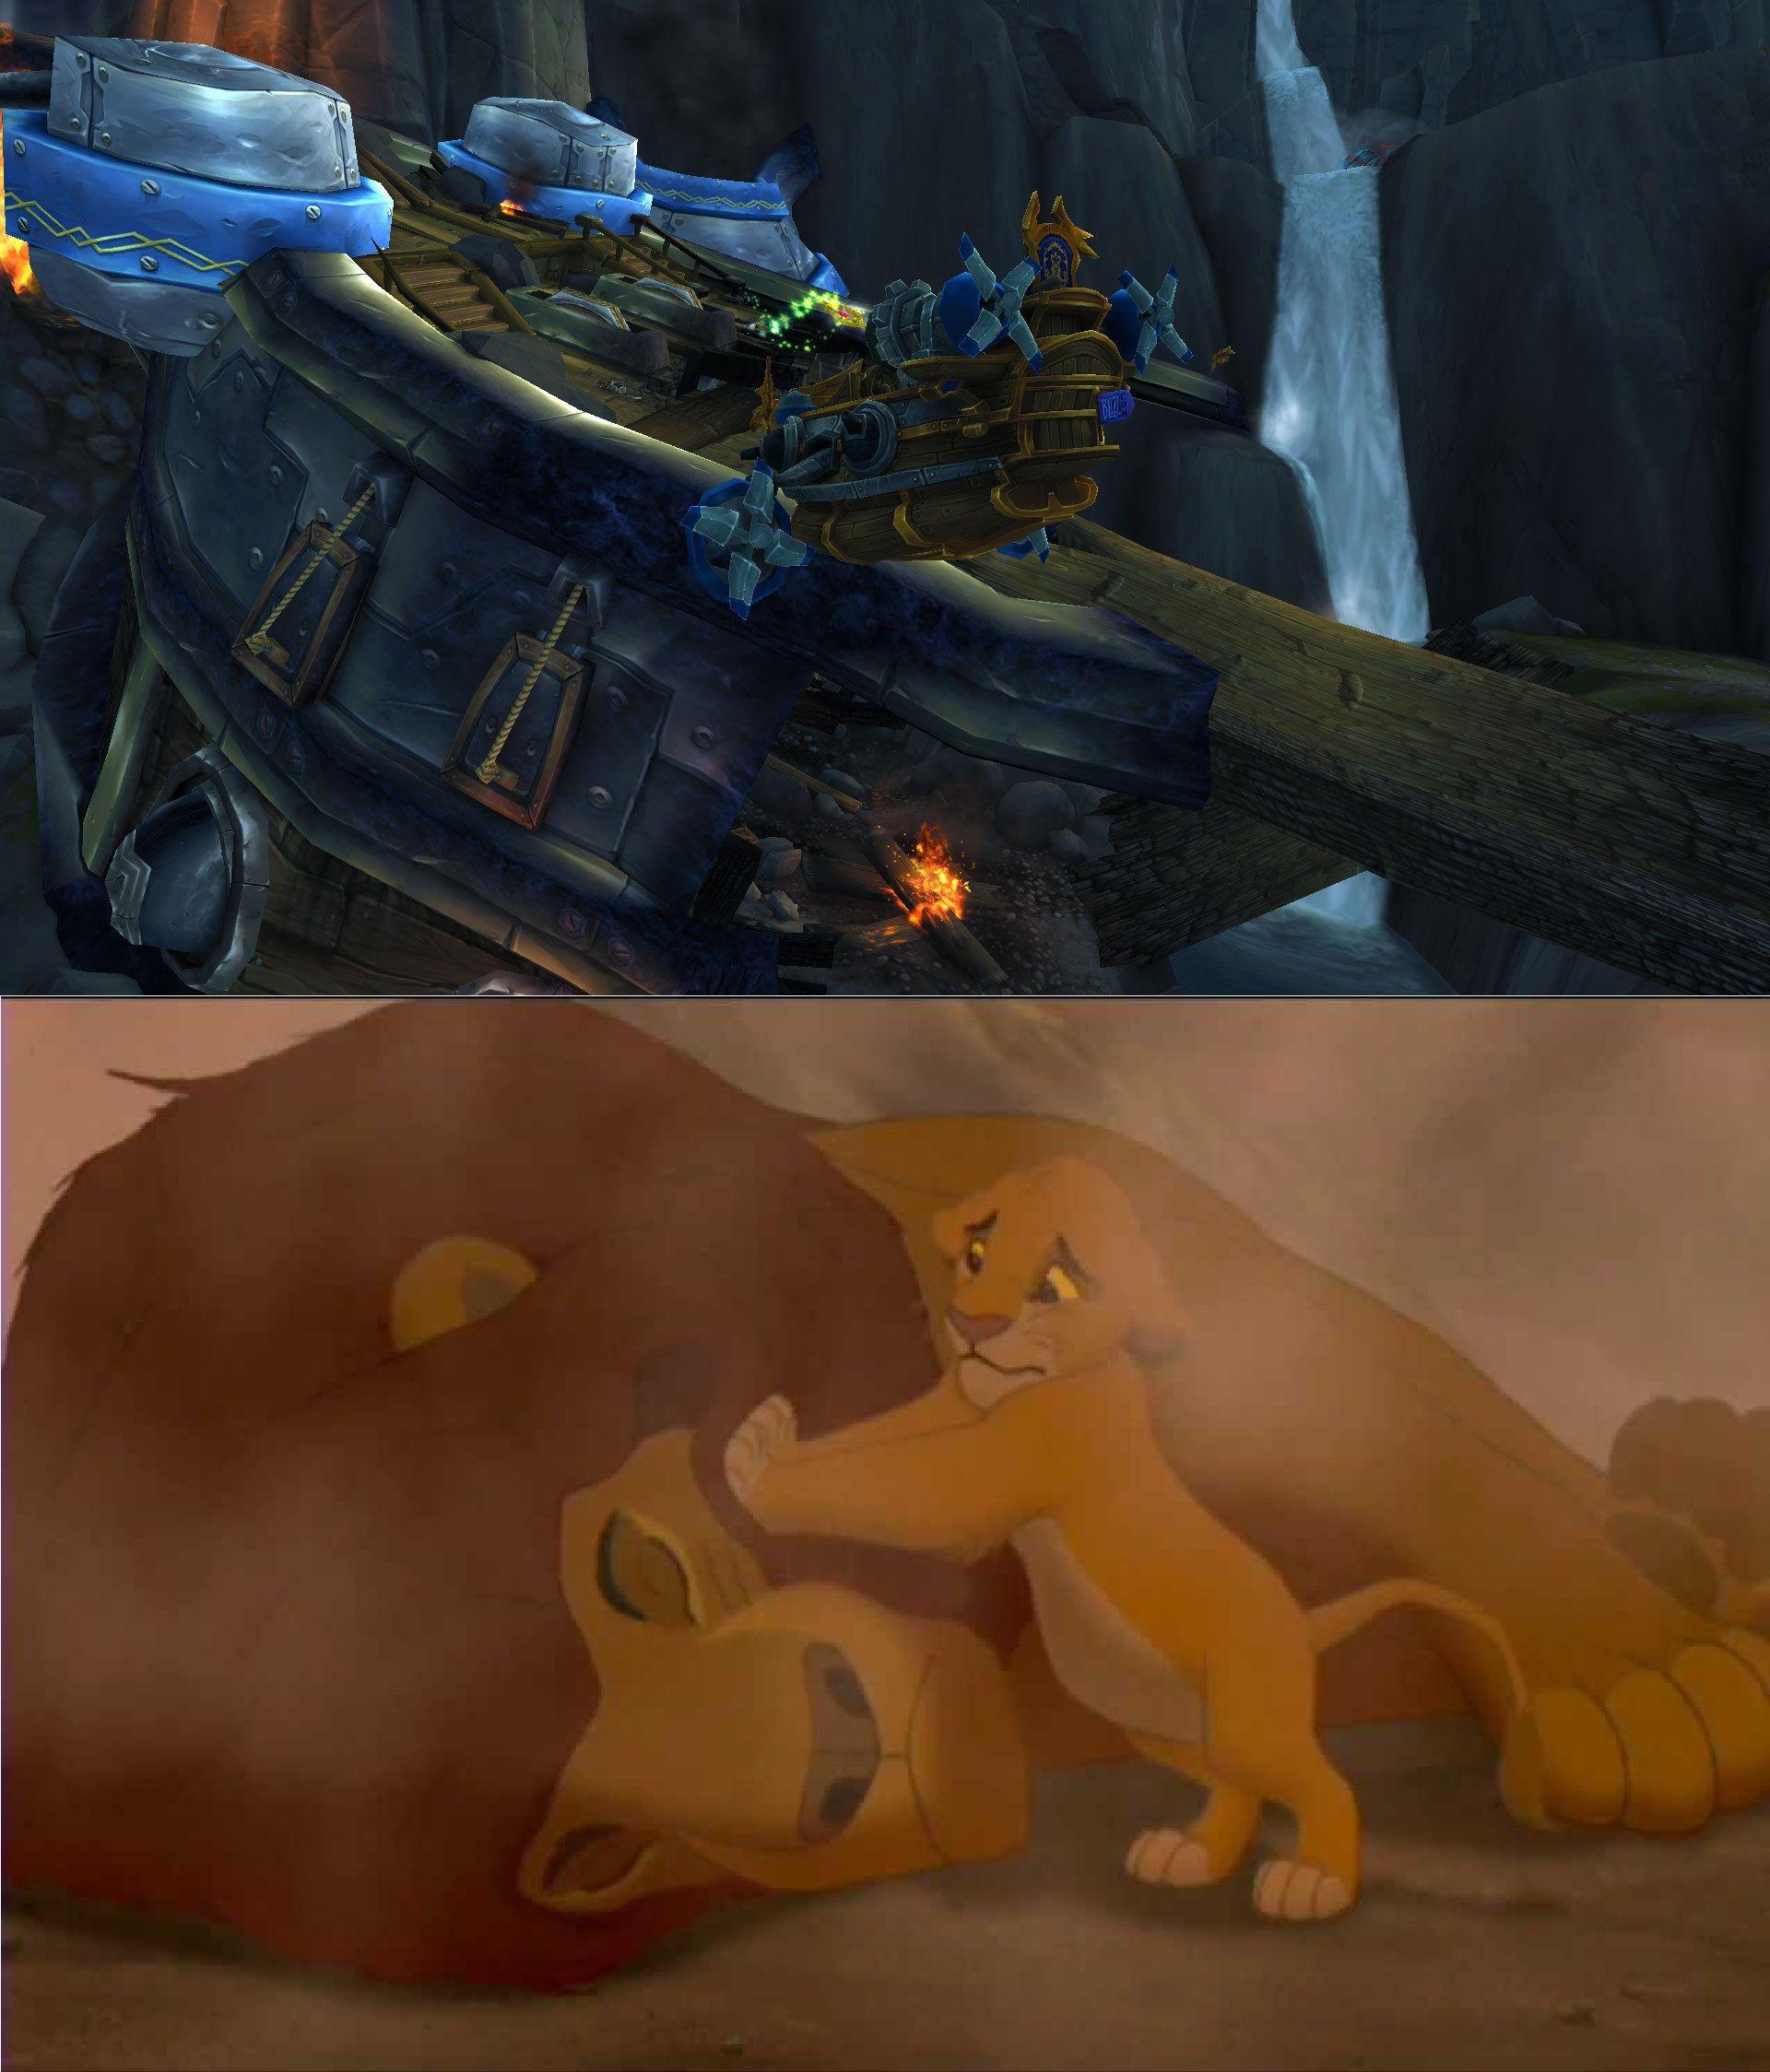 Skyfire you got to get up! #worldofwarcraft #blizzard #Hearthstone #wow #Warcraft #BlizzardCS #gaming